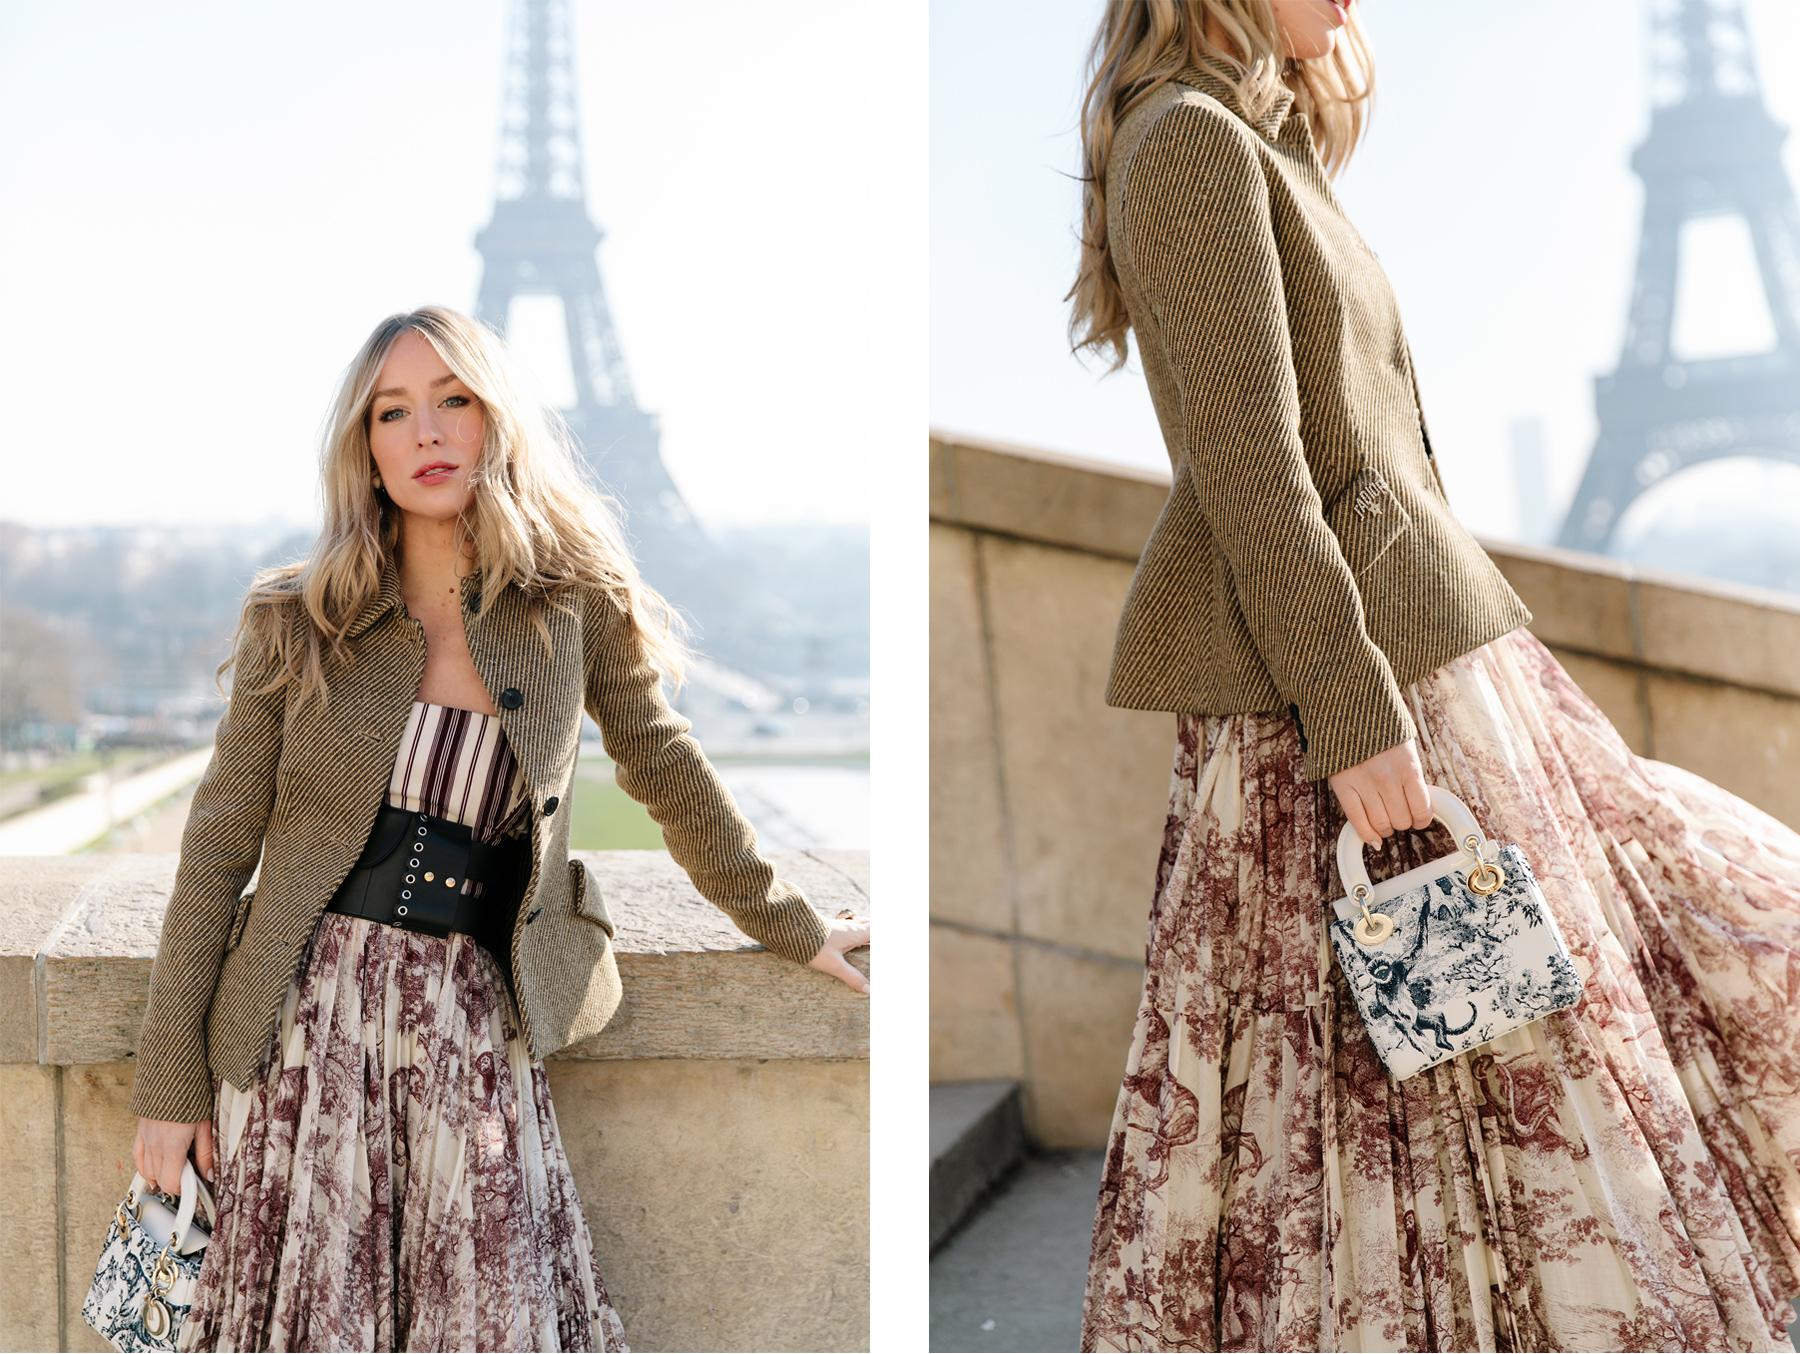 Carin_Olsson_Dior_02.jpg